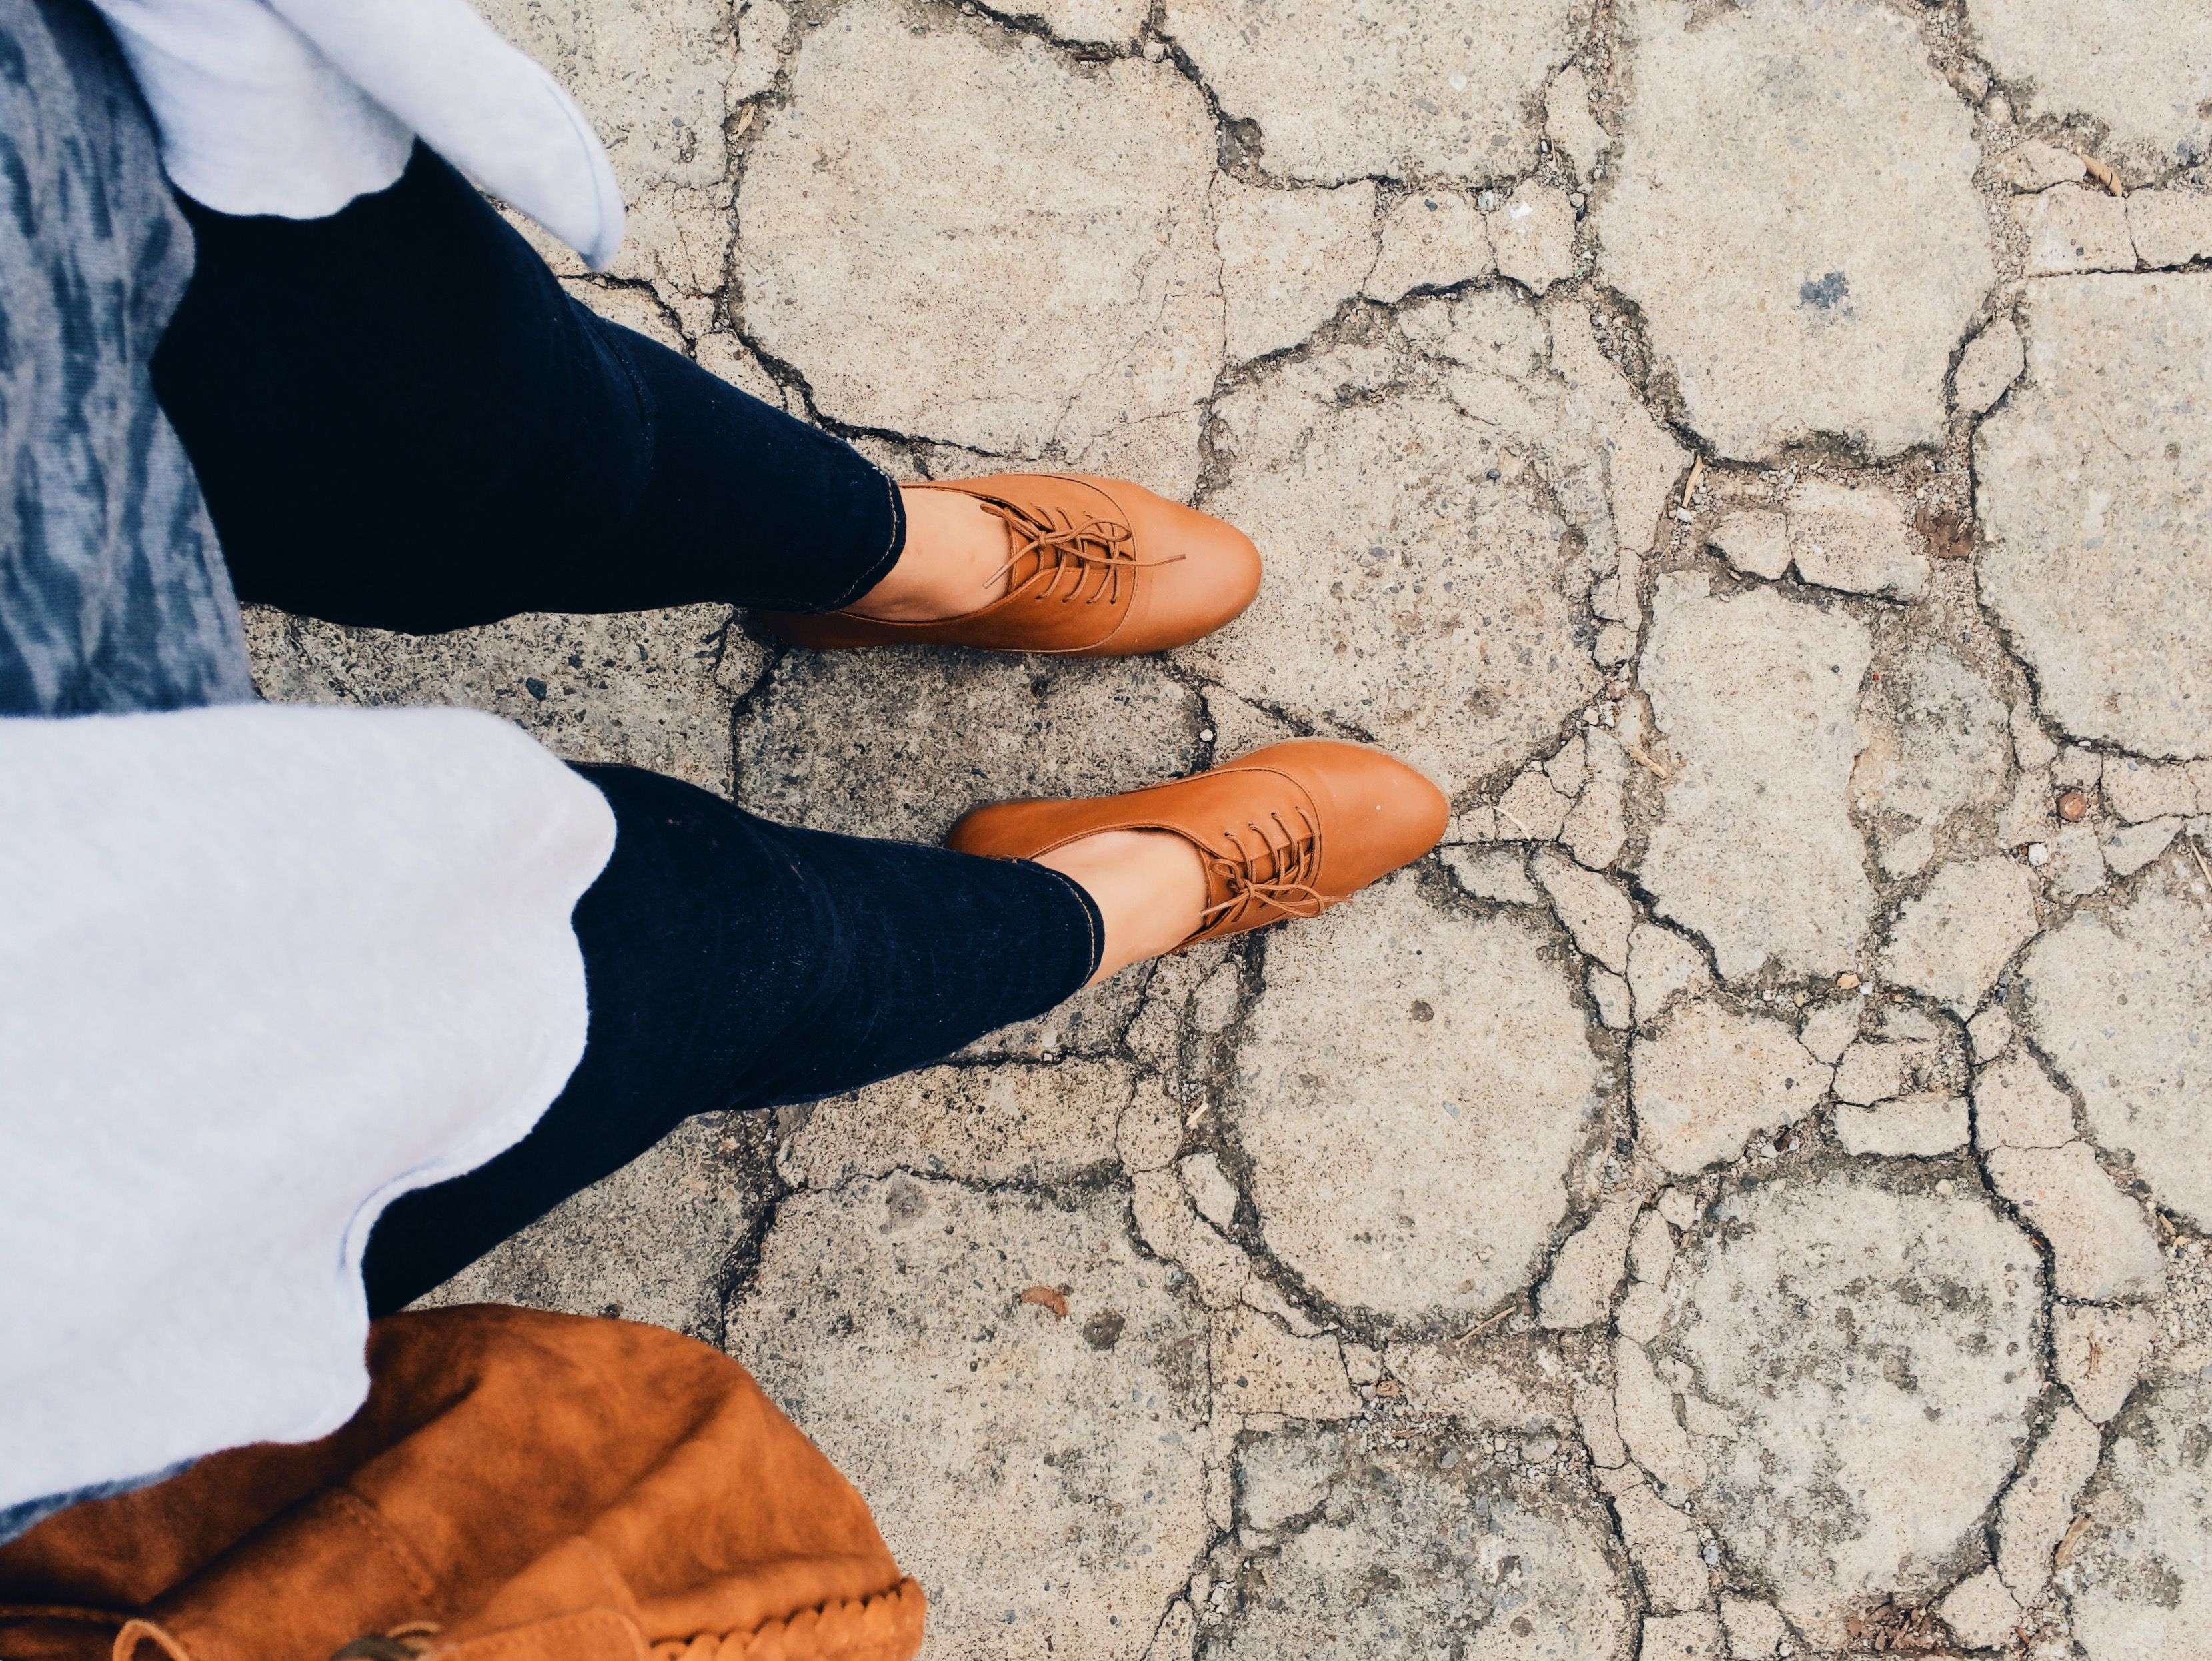 Oxfords #fashion #oxfords #shoes #comfortable